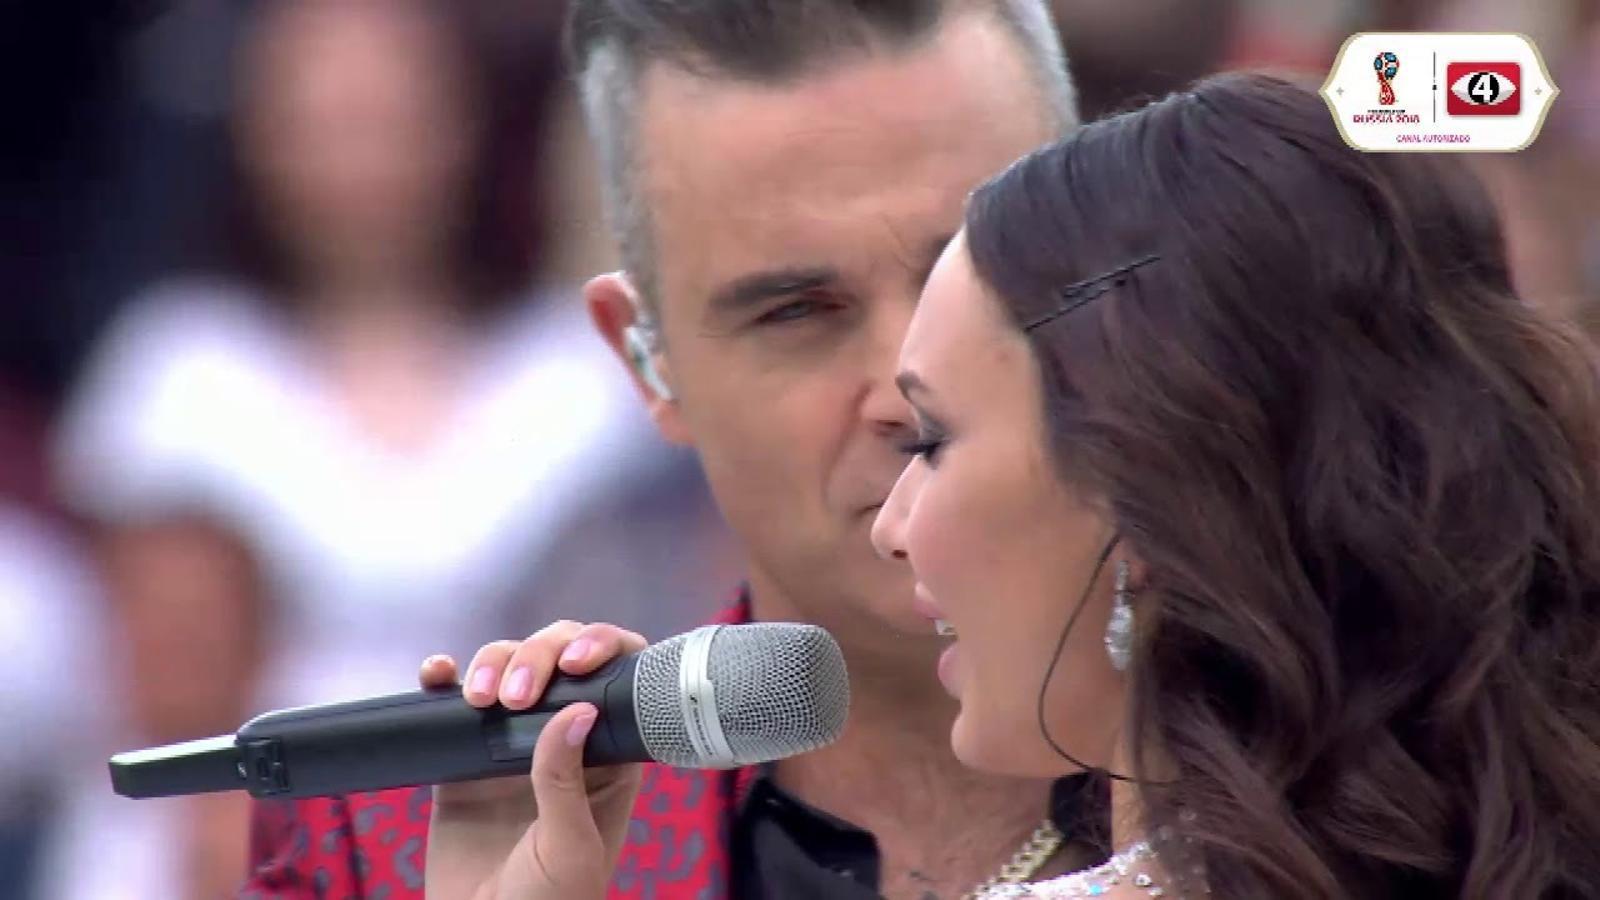 Actuació completa de Robbie Williams al Mundial de Rússia